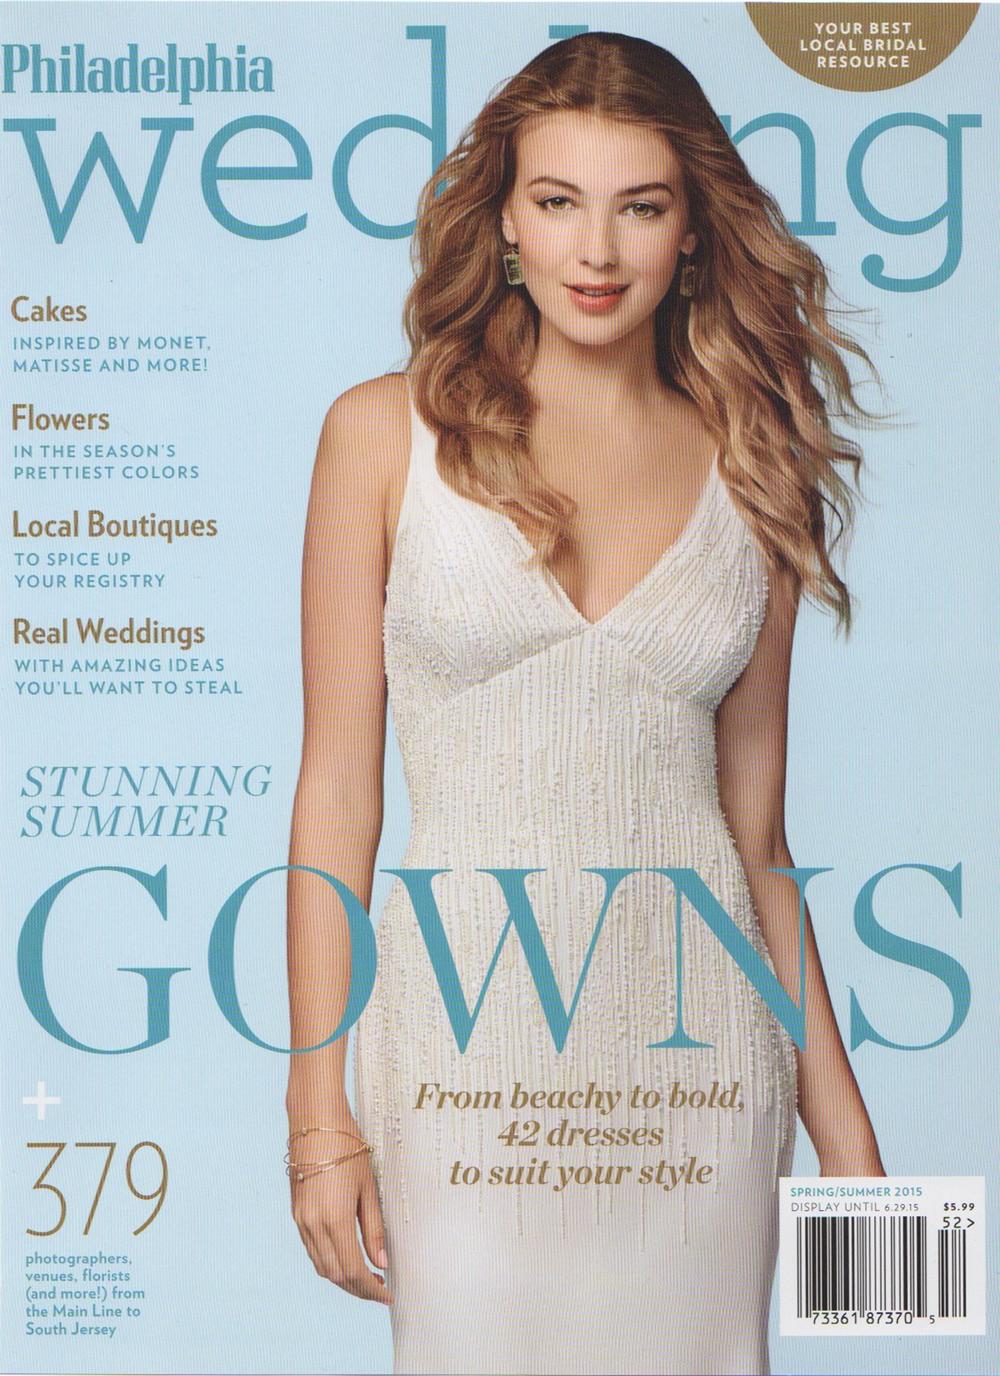 Gabriella Kiss pale green aquamarine earrings on cover of Philadelphia Wedding Spring/Summer 2015